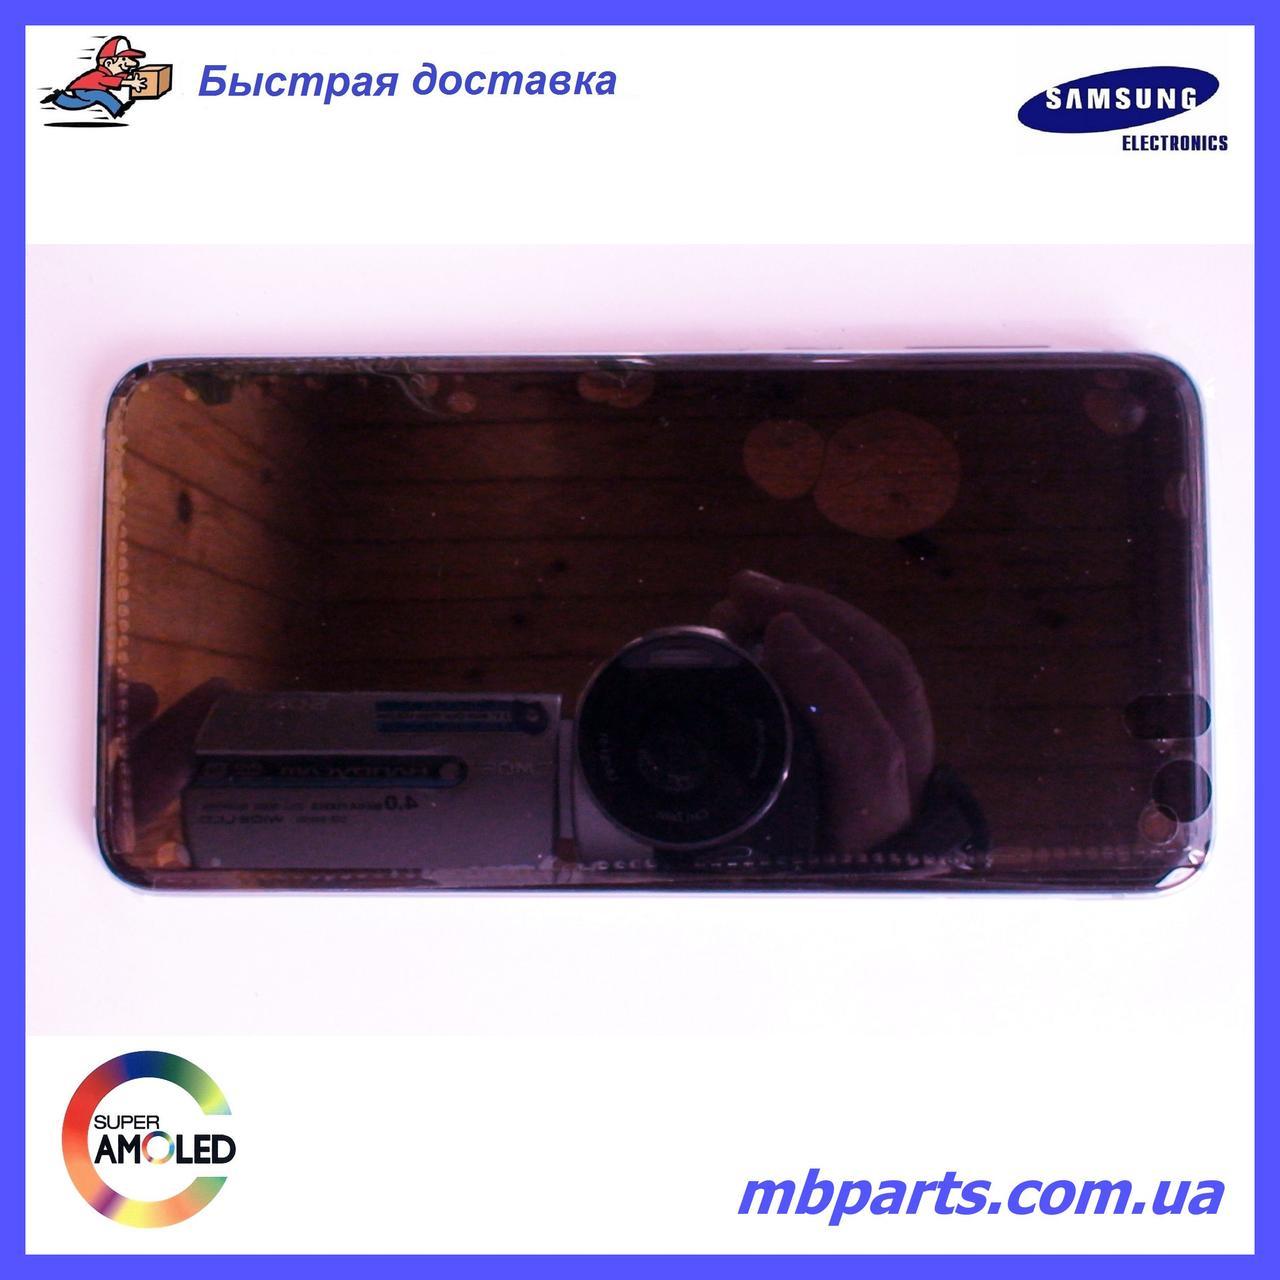 Дисплей с сенсором Samsung G970 Galaxy S10e  Green, GH82-18852E, оригинал!